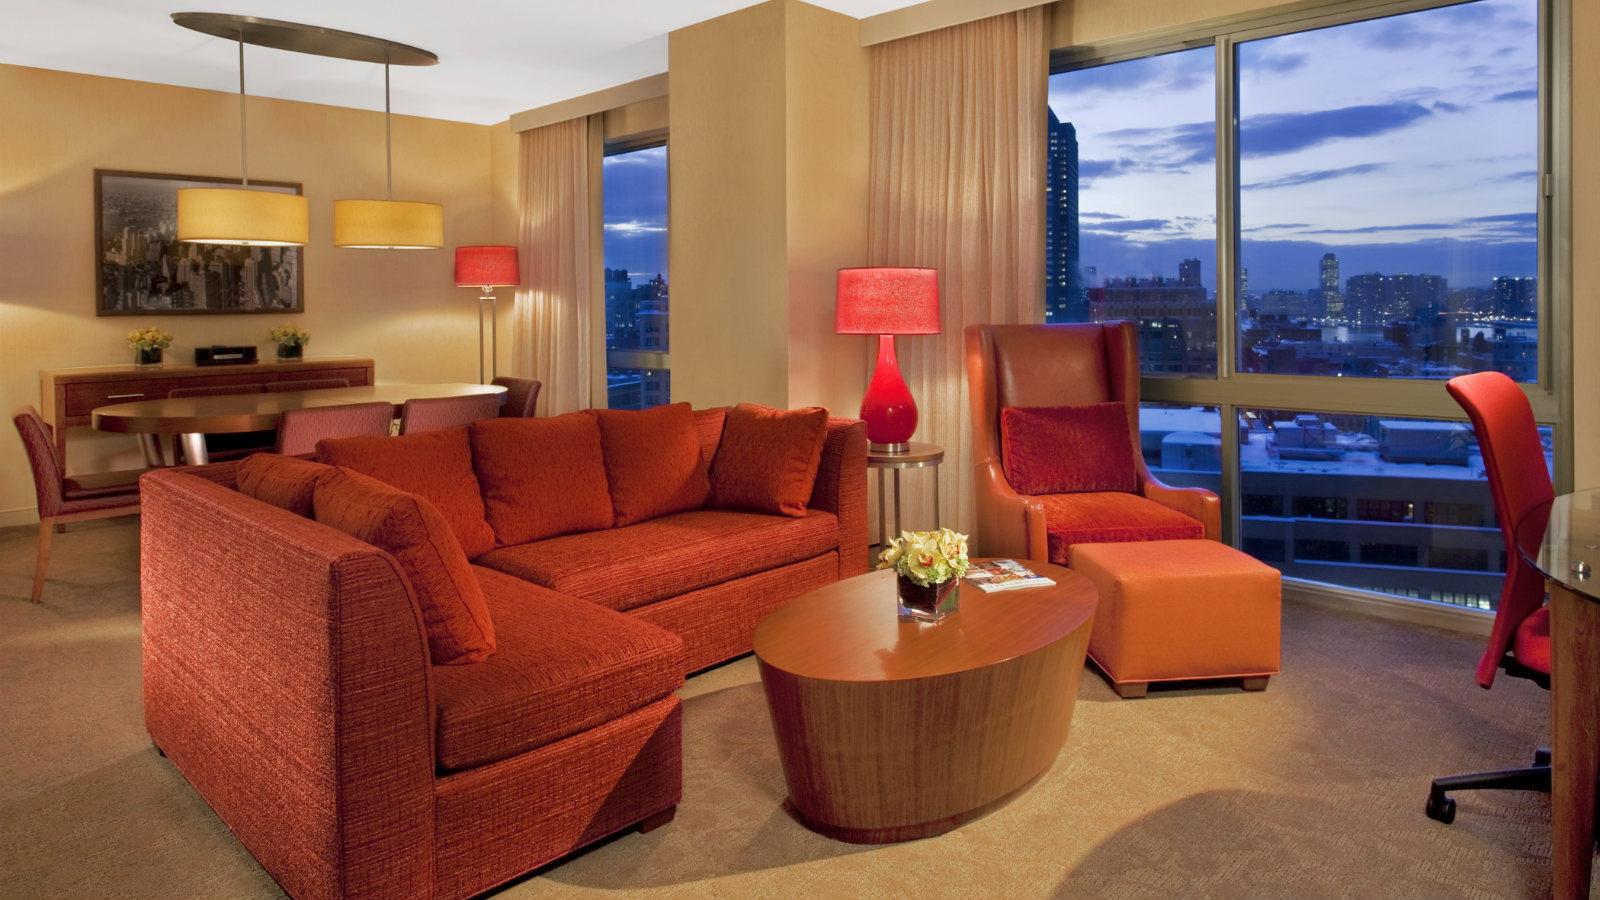 Singapore S Ascott Reit Buys Sheraton Tribeca New York Hotel Hotel Management